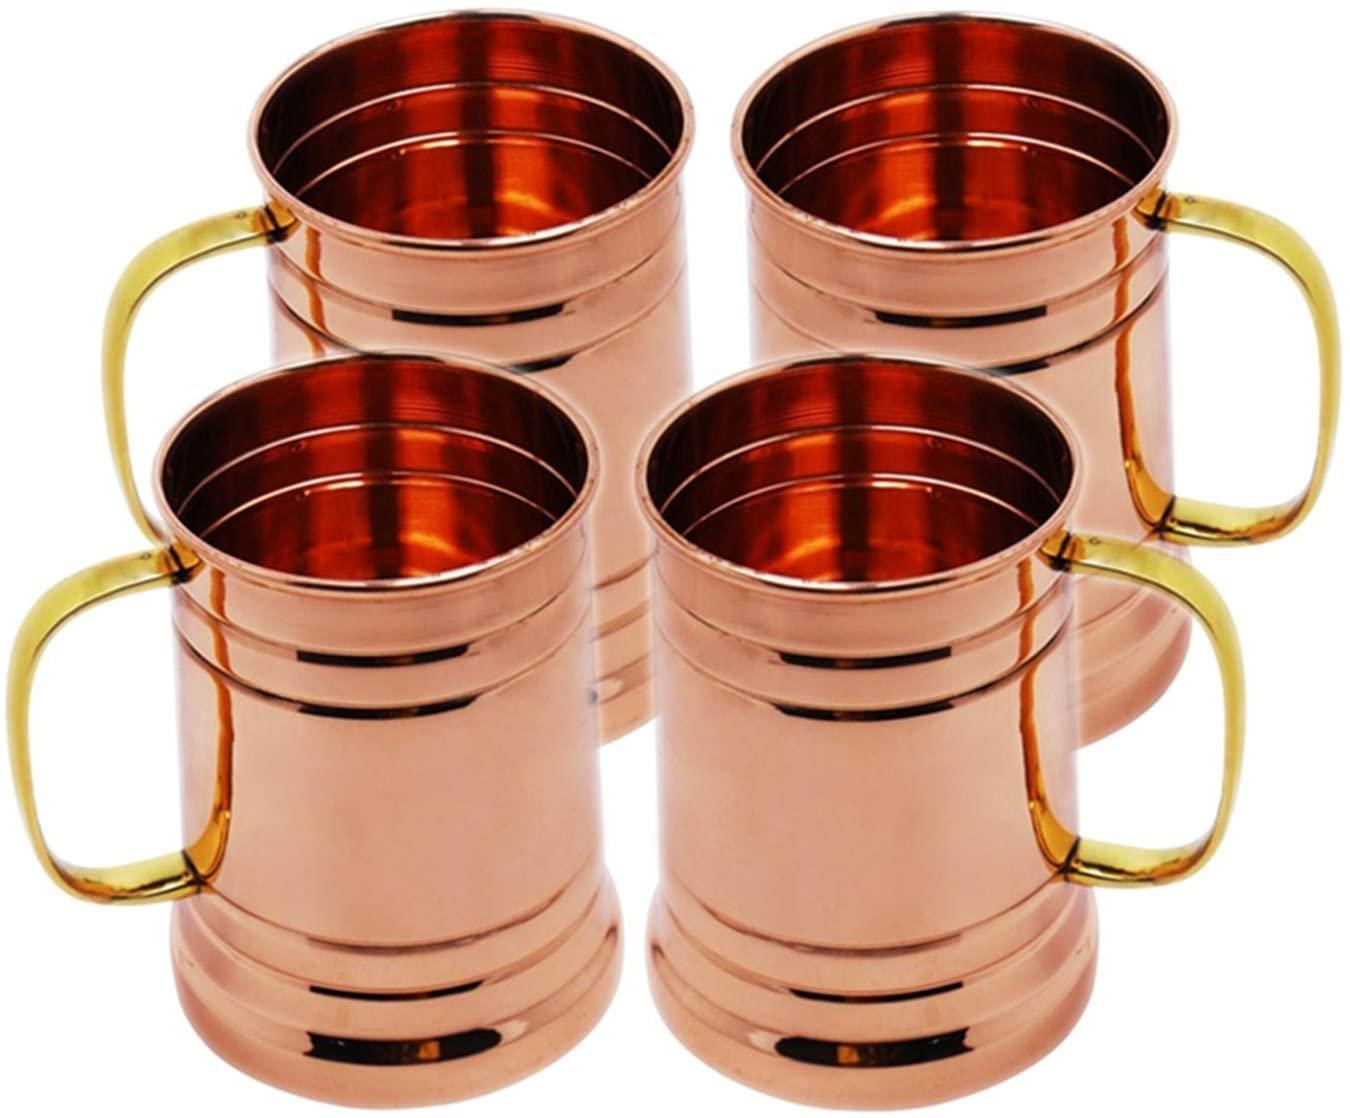 Handicraft Hub 4 PCS Copper Tankard Large Moscow Mule Mug Copper Mugs Capacity 20 Ounce